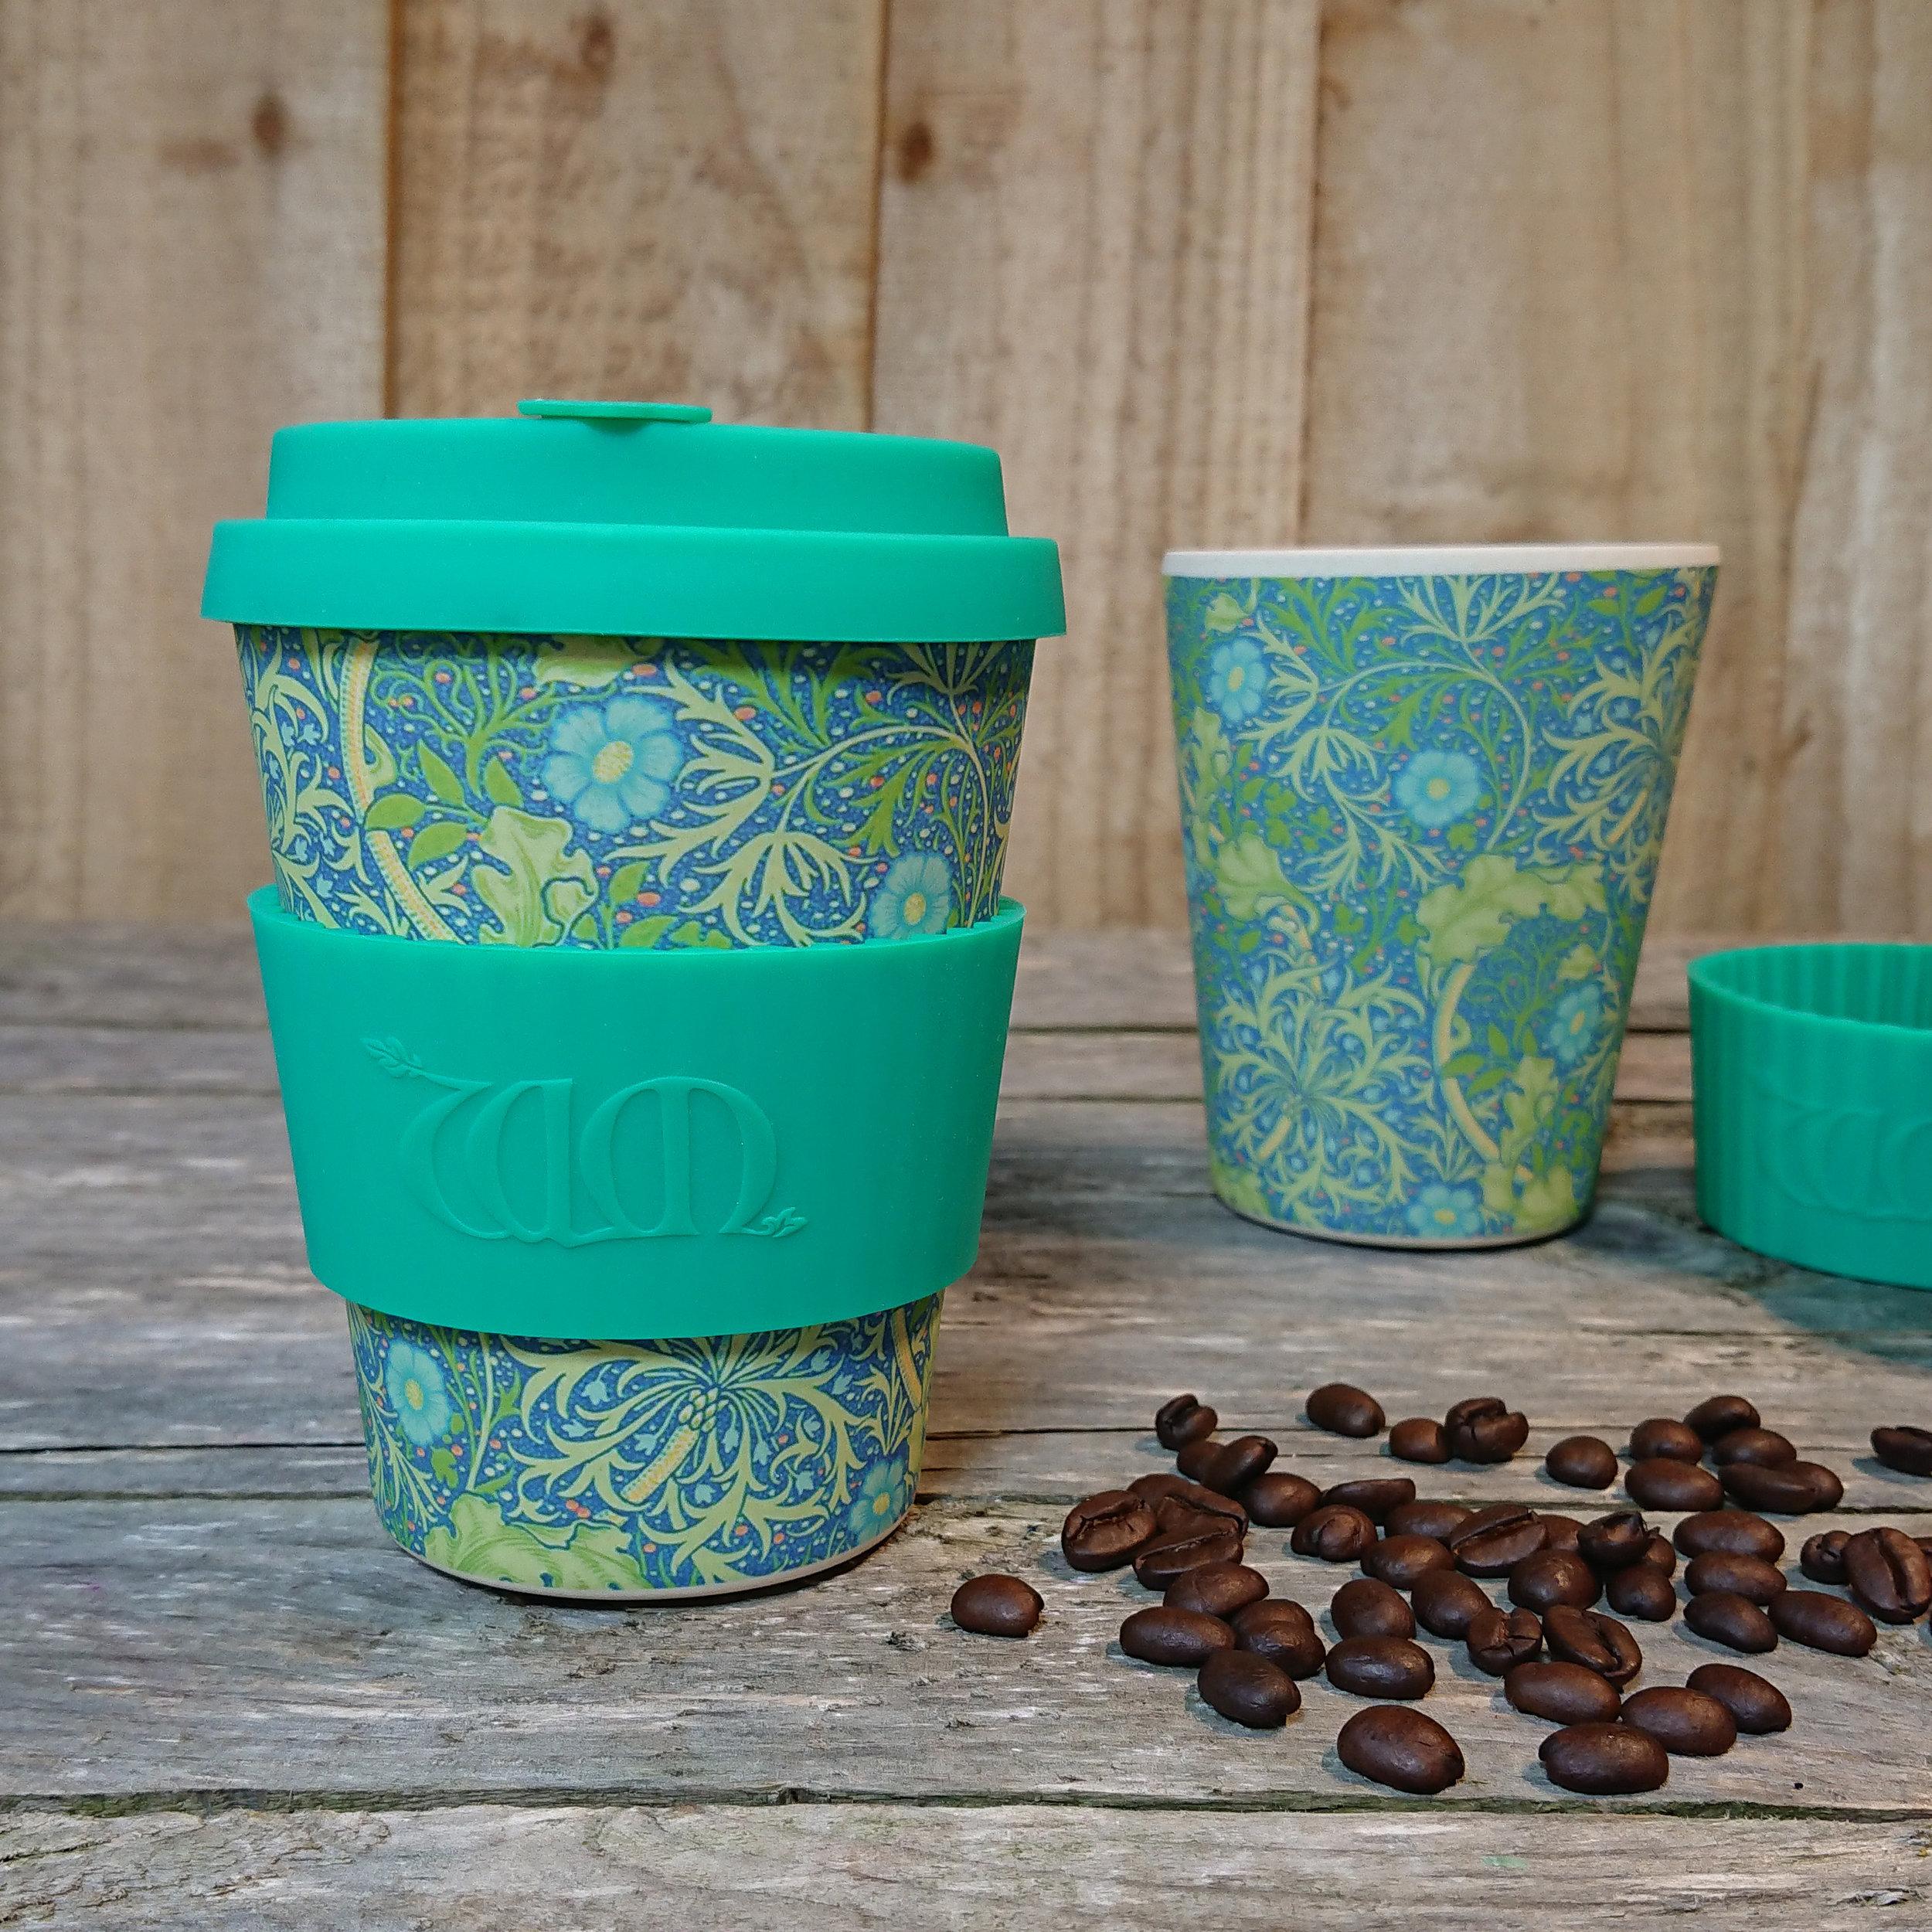 Papafranco Eco Friendly Ecoffee Cup 12oz Reusable Bamboo Fibre Travel Mug